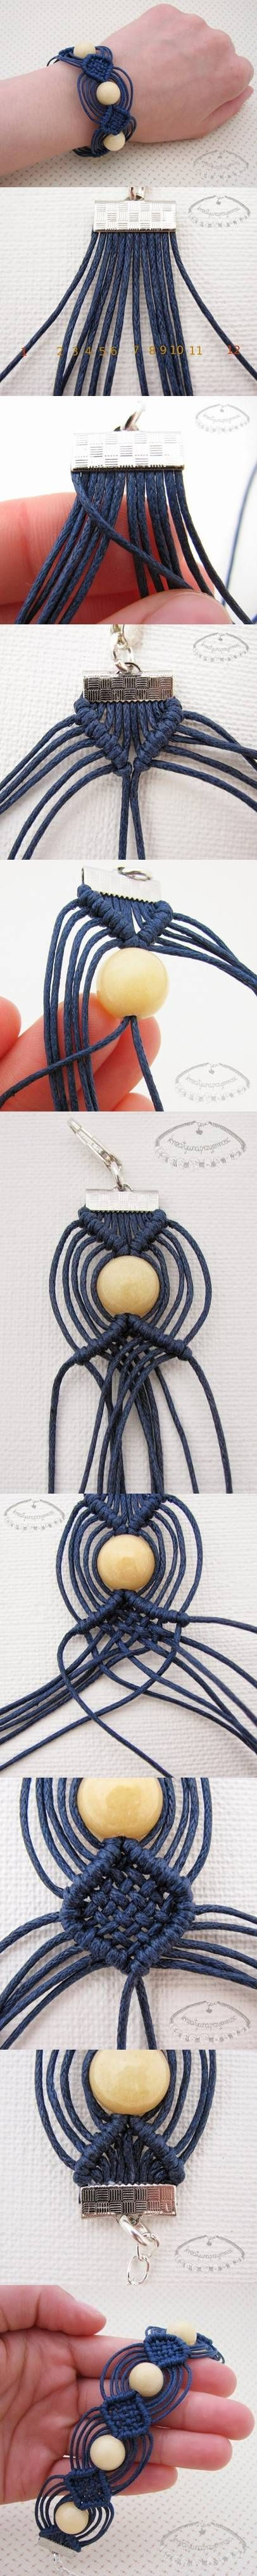 DIY Macrame Beads Bracelet DIY Macrame Beads Bracelet